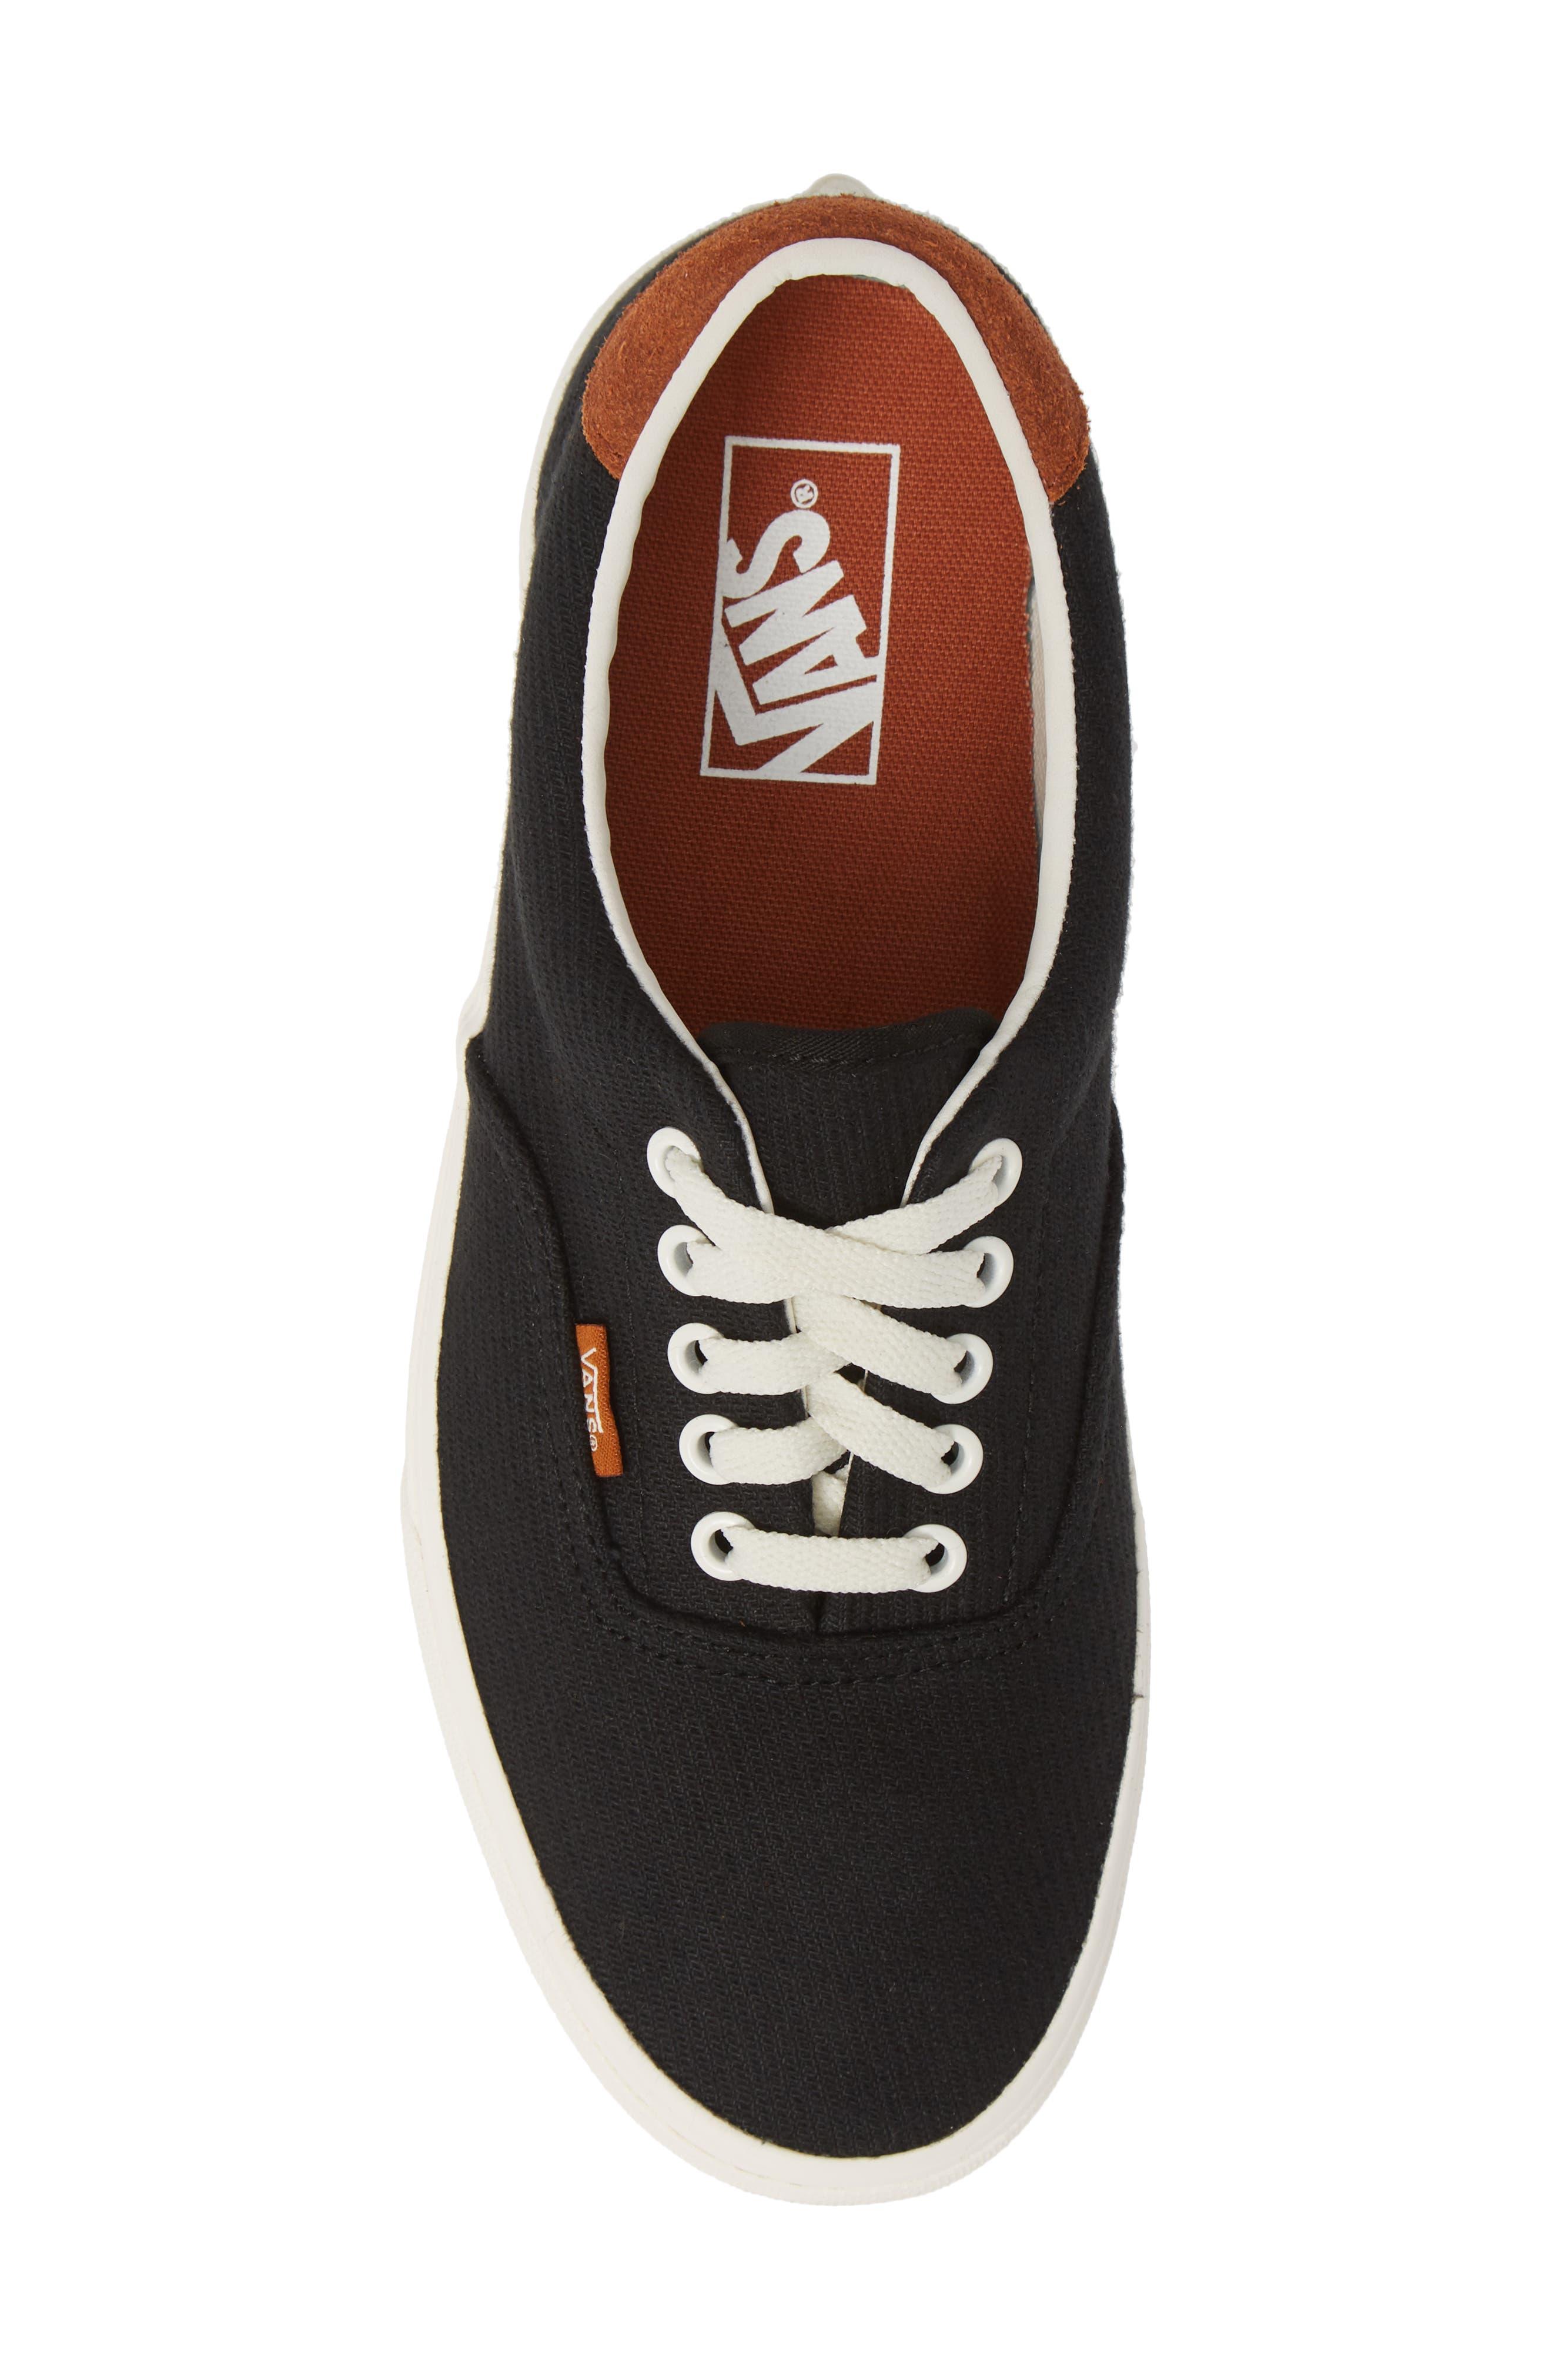 Flannel Era Sneaker,                             Alternate thumbnail 5, color,                             BLACK FLANNEL FLANNEL